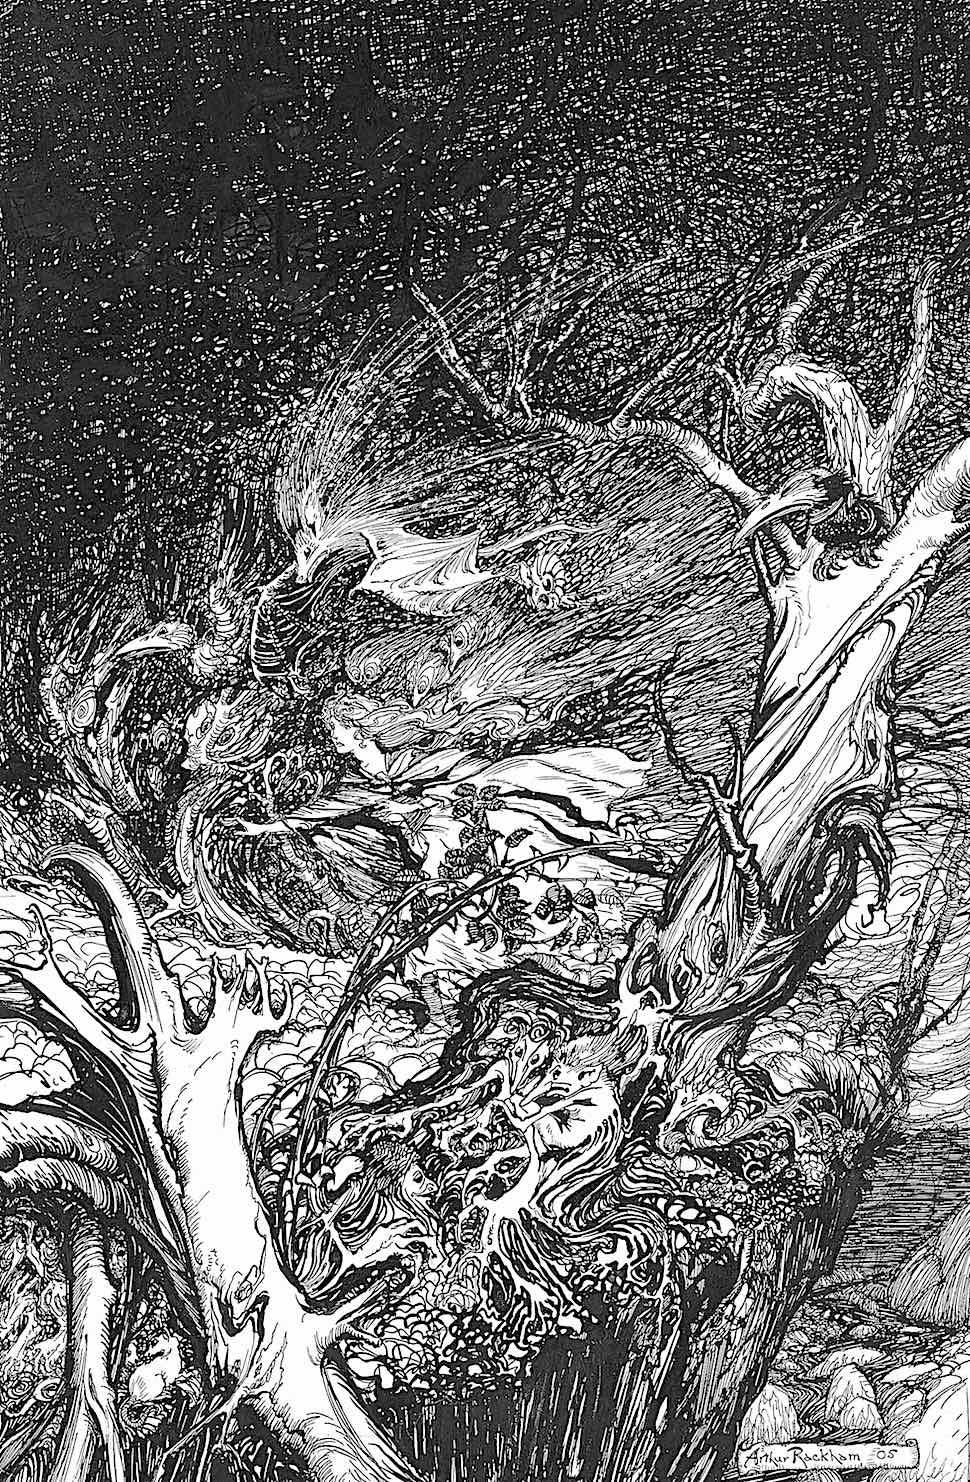 an Arthur Rackham illustration